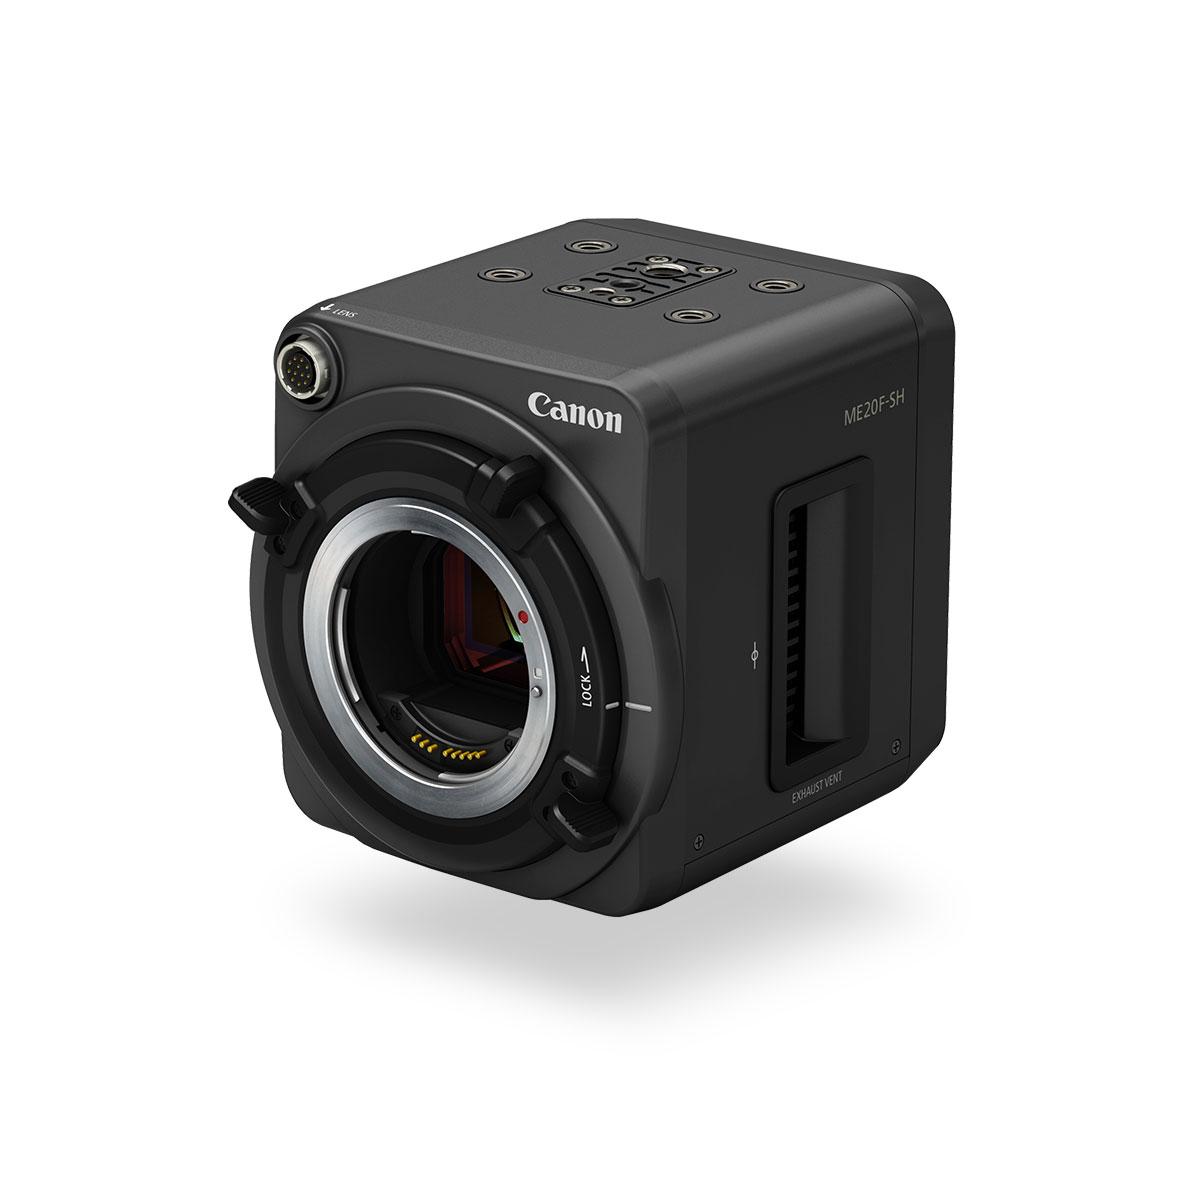 ME20F-SH camera left